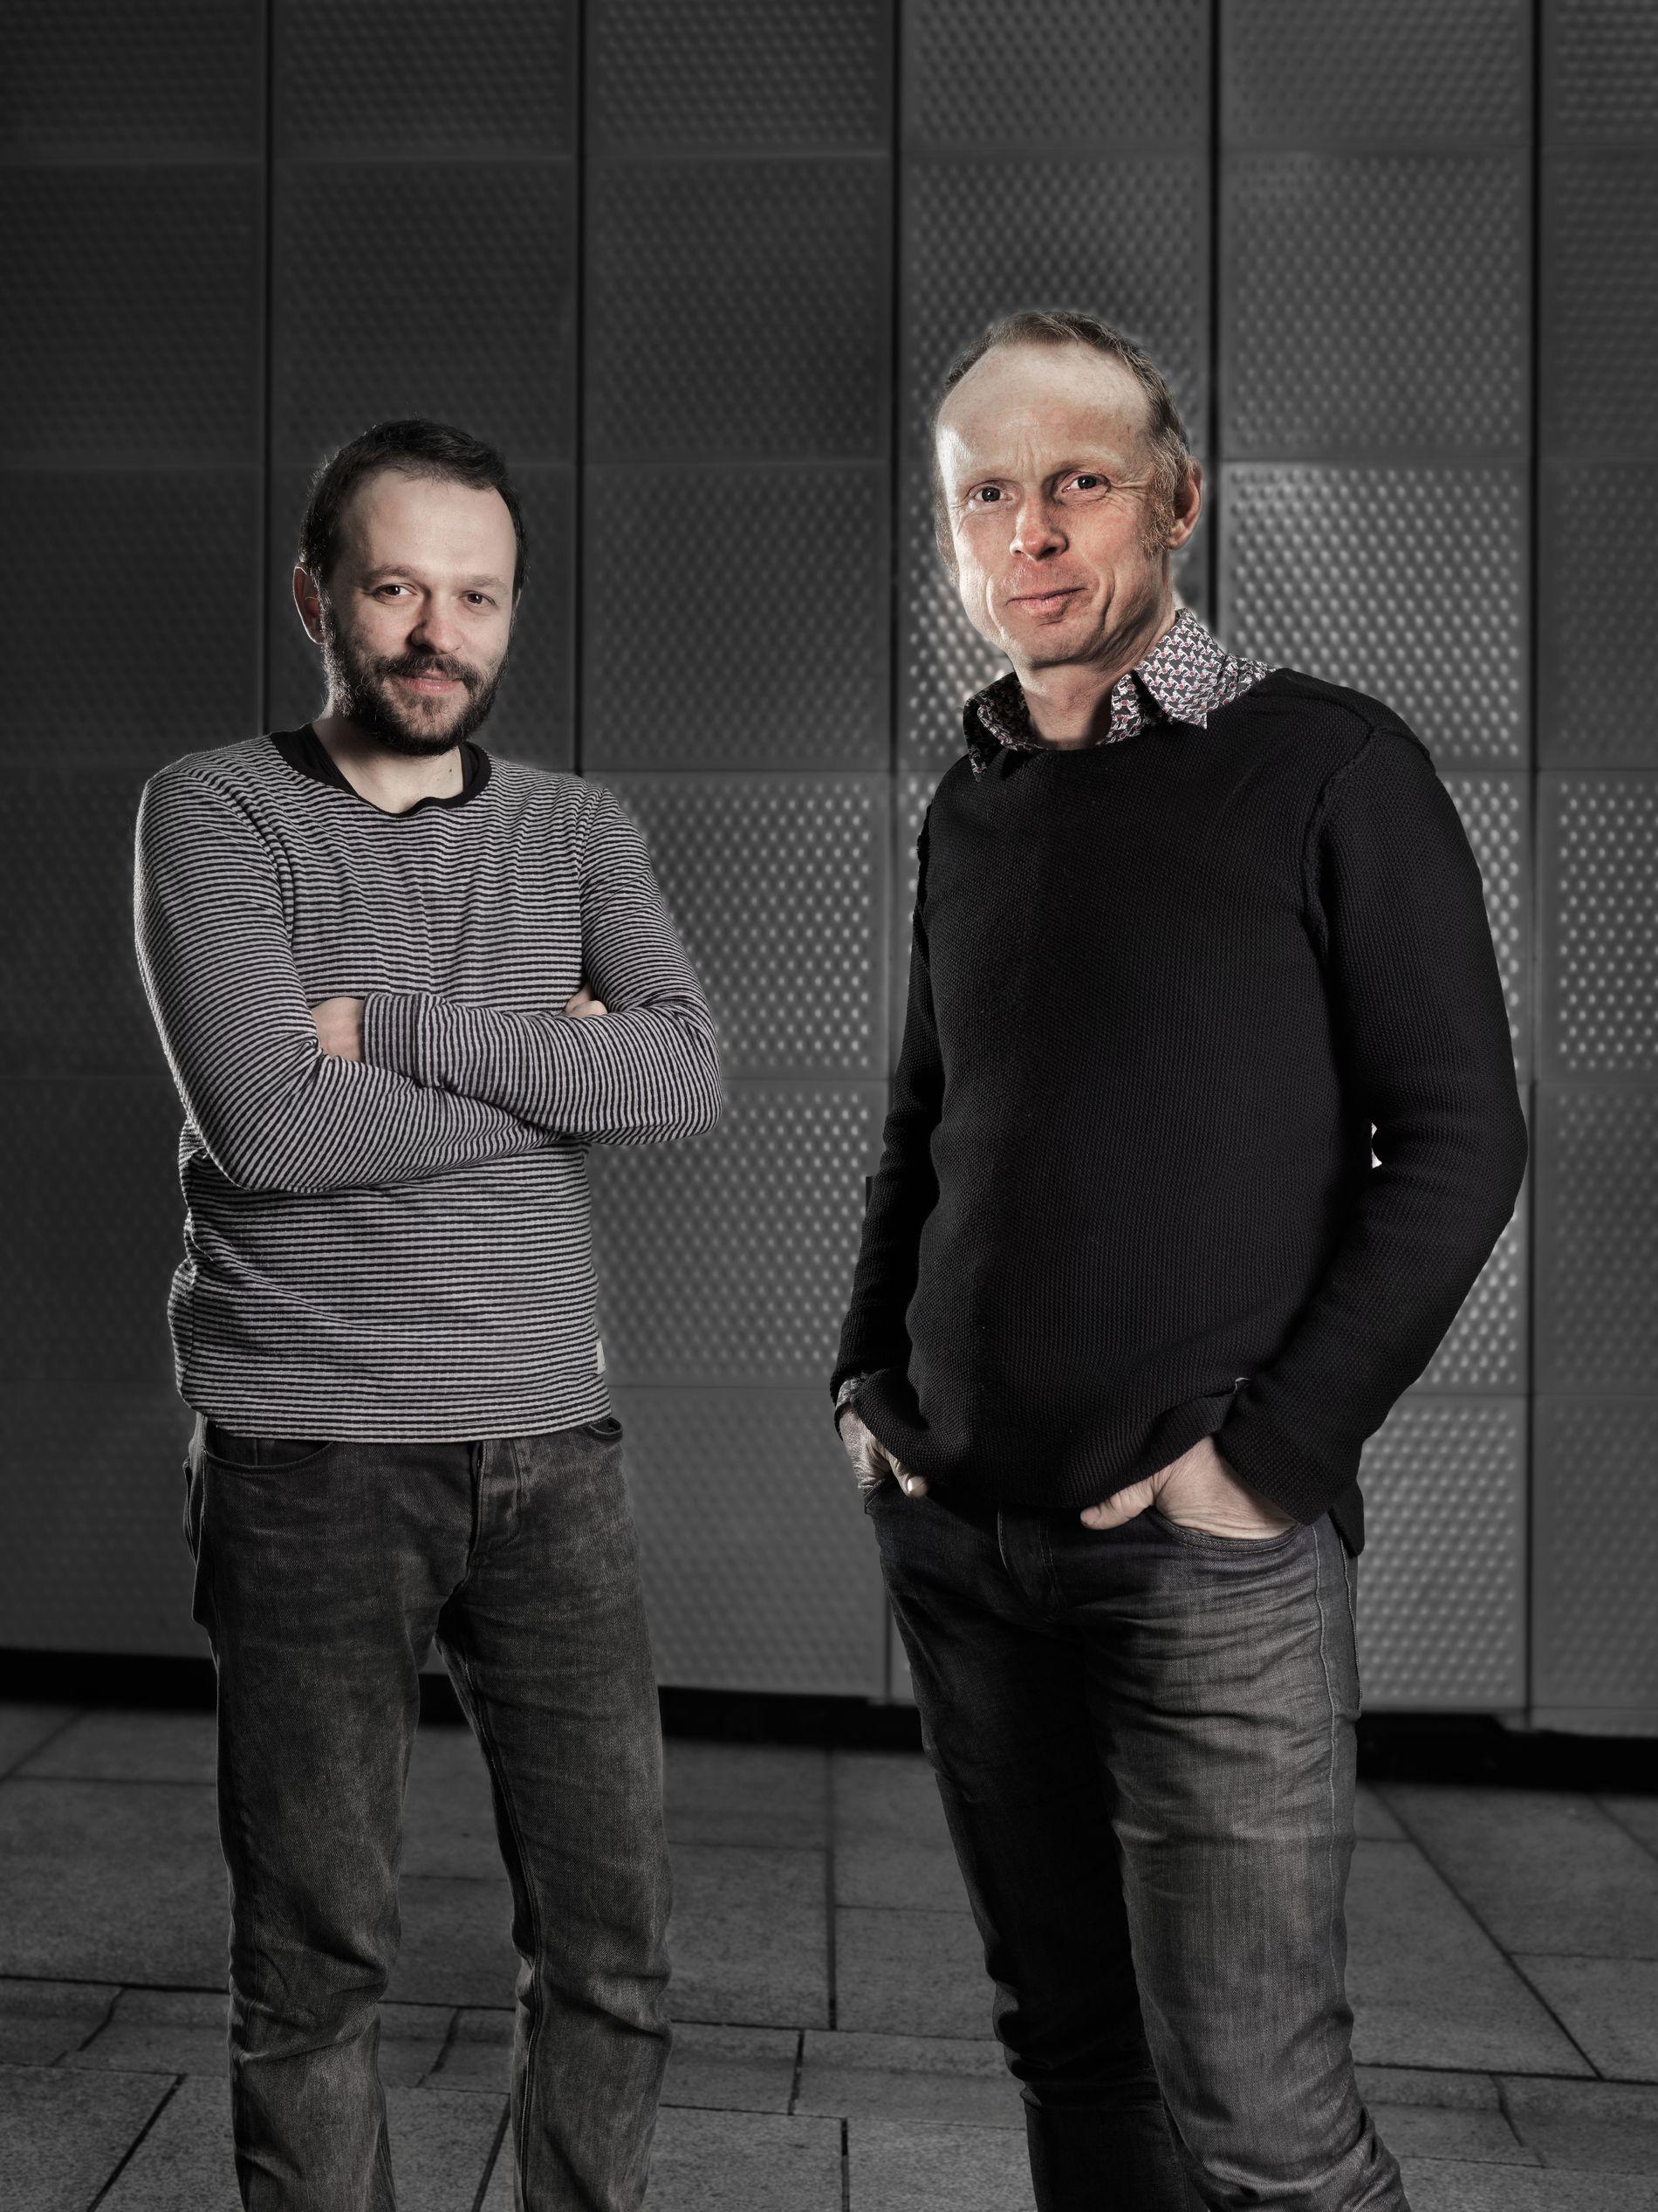 NYE PARADIS: Arkitekt Marko Todorovic og arkitekt Jesper Jorde i TAG Arkitekter har tegnet boligprosjektet Paradisalléen.